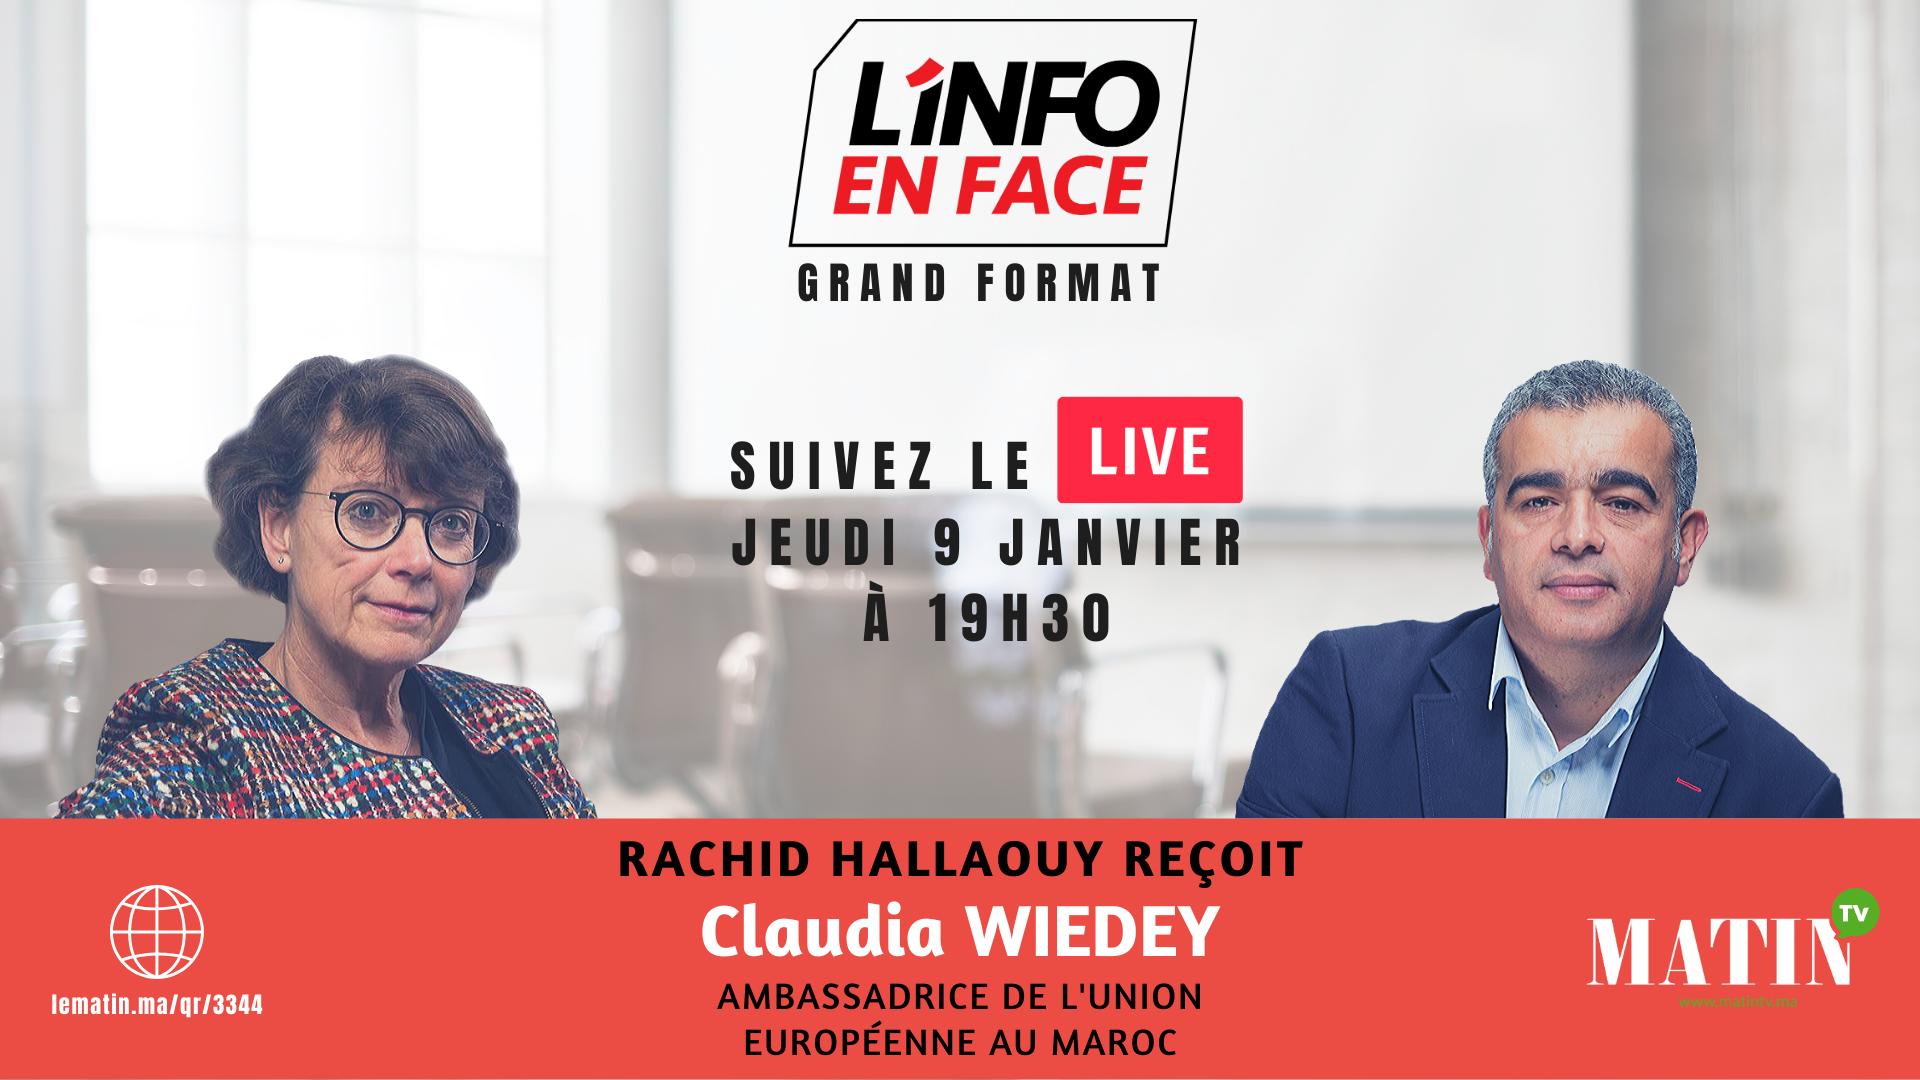 Live : Claudia Wiedey, Ambassadrice de l'Union européenne au Maroc